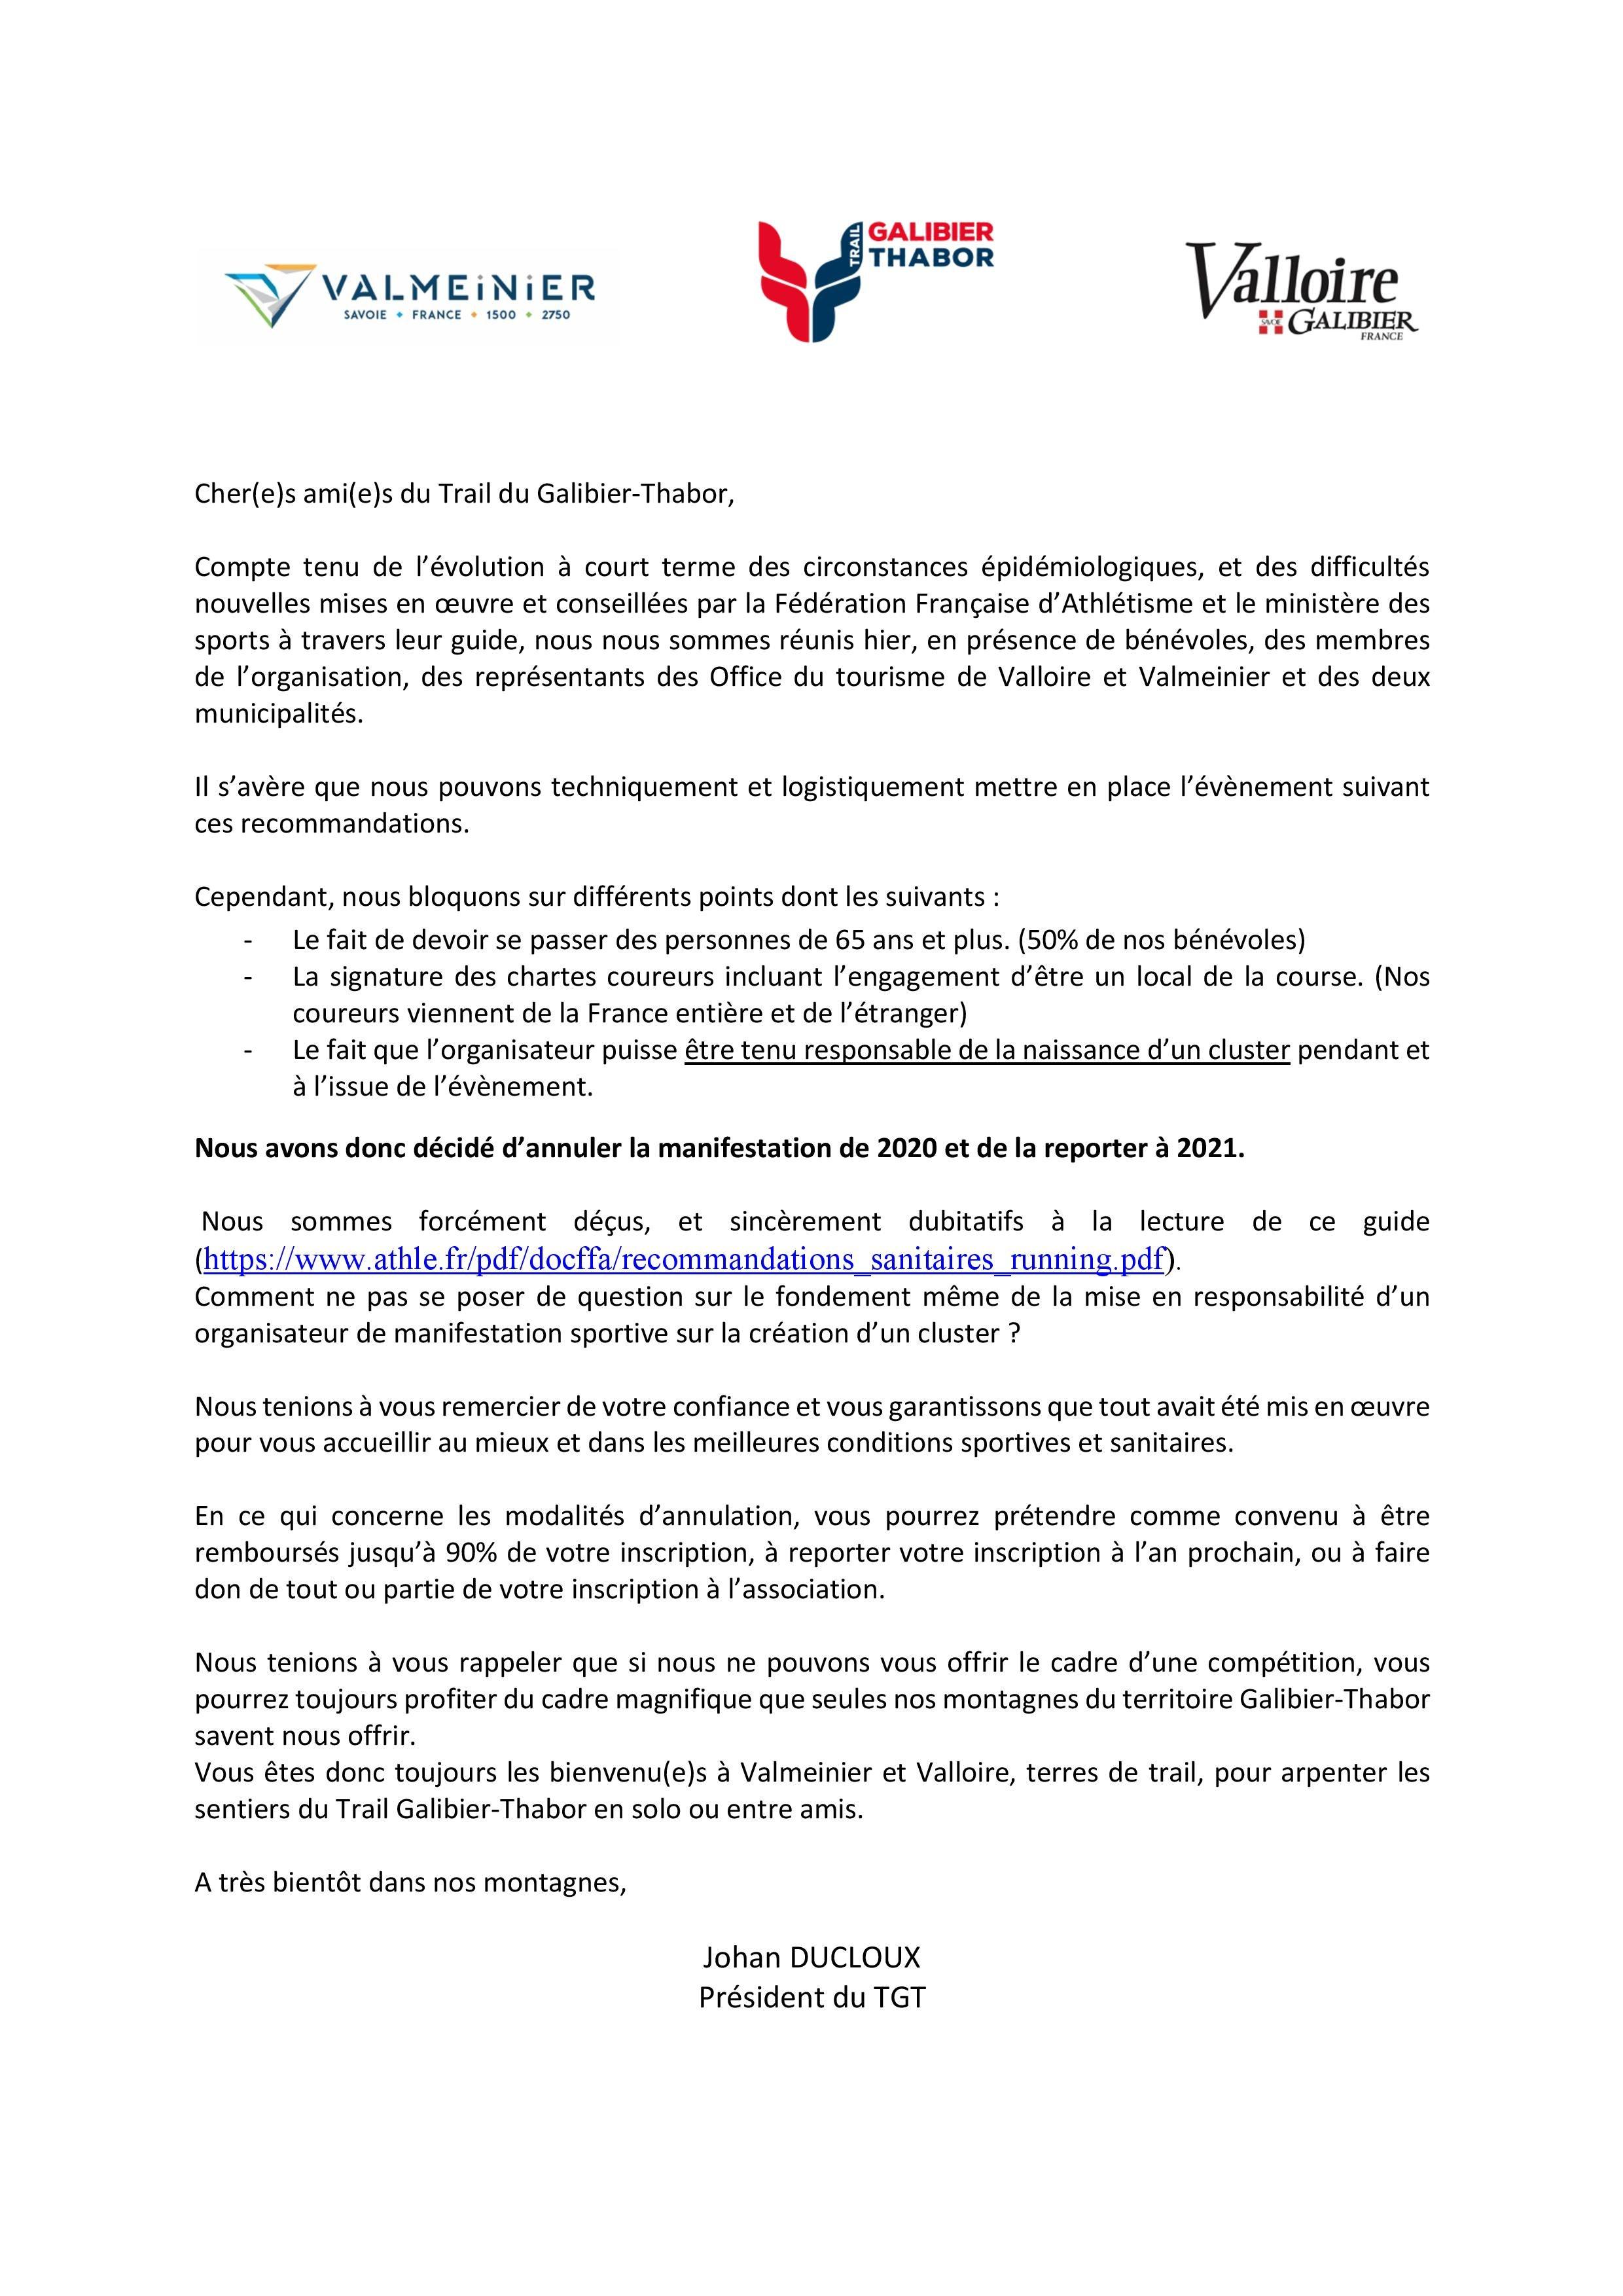 Communiqué annulation Trail du Galibier-Thabor 2020